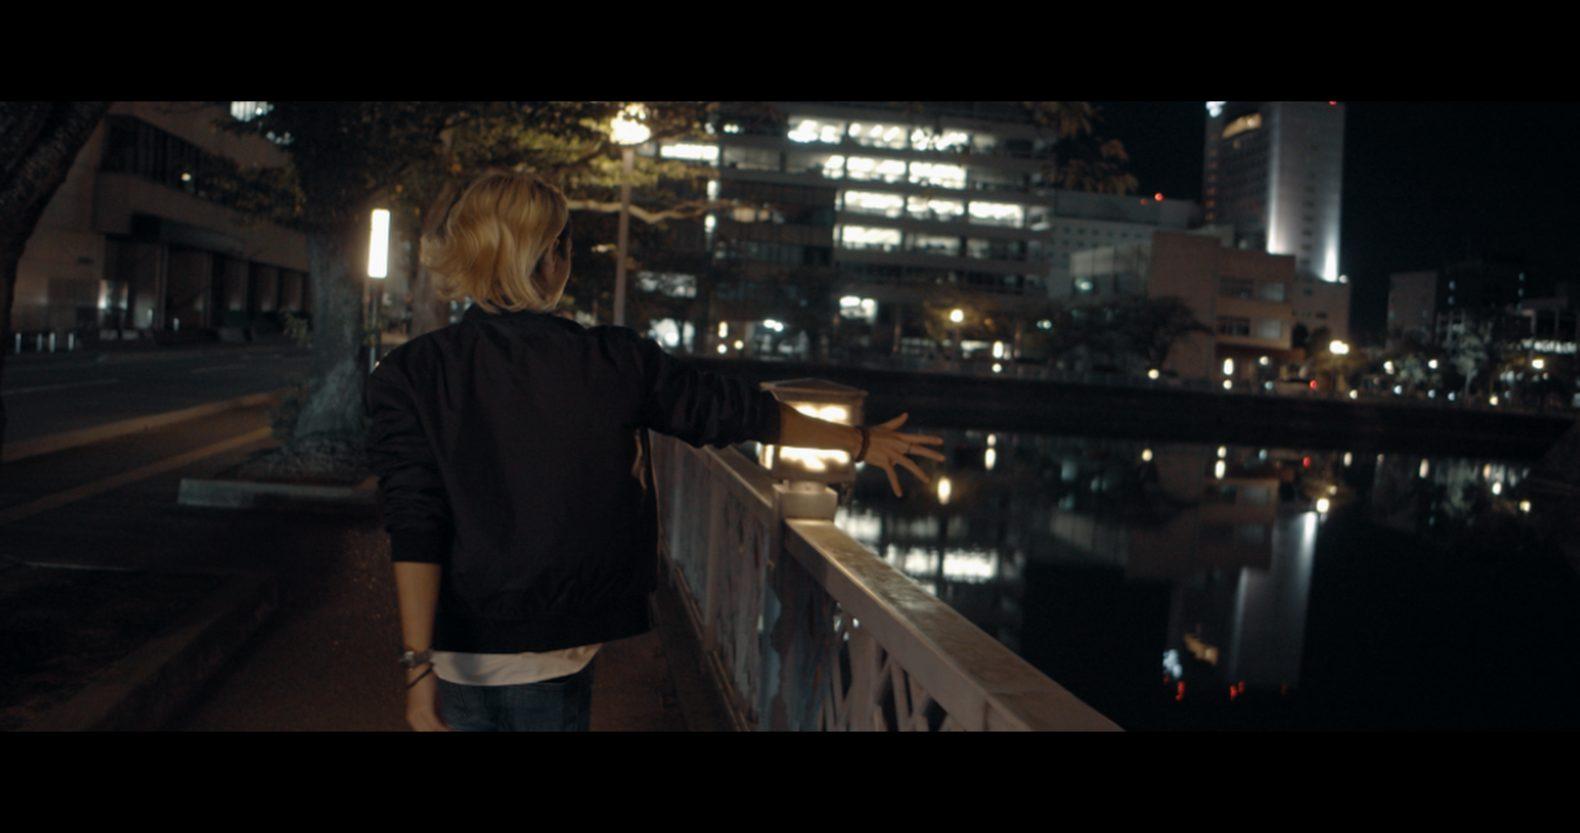 4K映像制作事例:StayHome_StayTuned FUKUI「敗北の少年_ティザーMV ナイトショット」